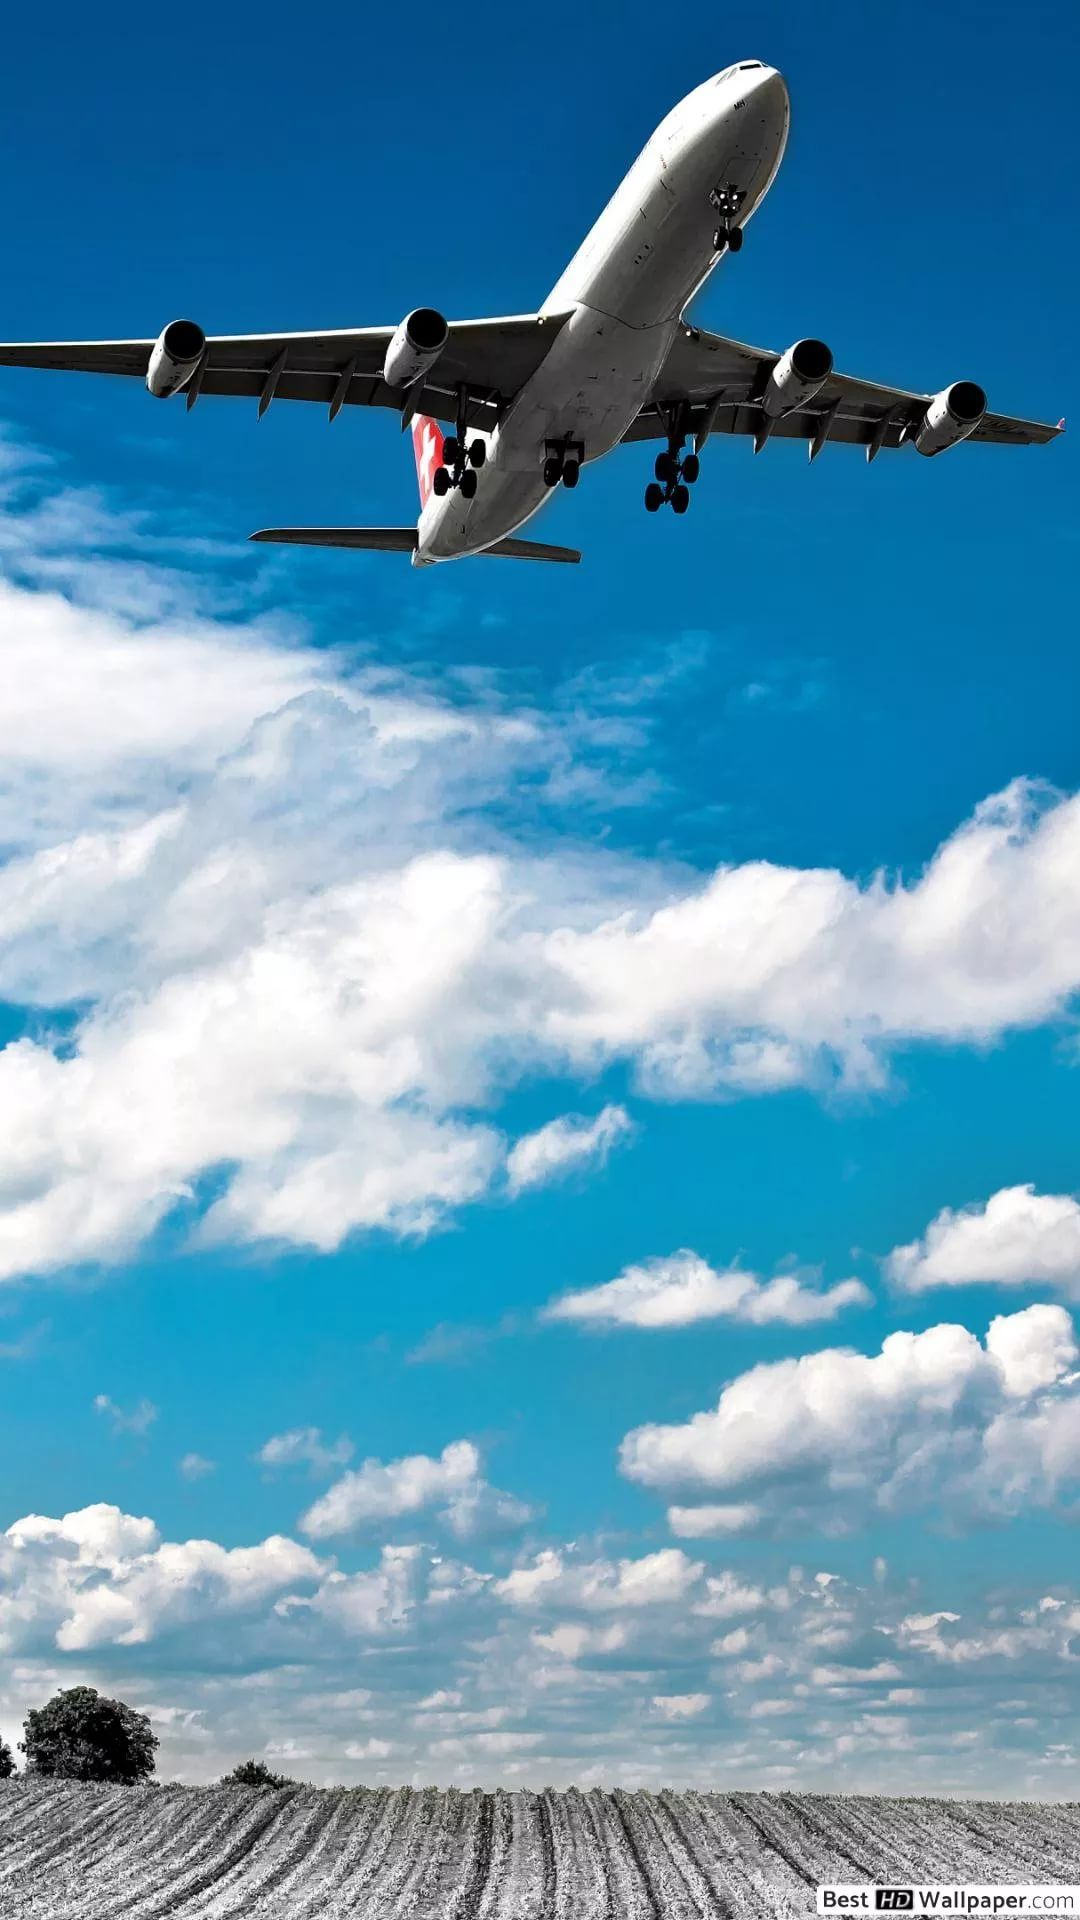 Airplane Galaxy wallpaper hd